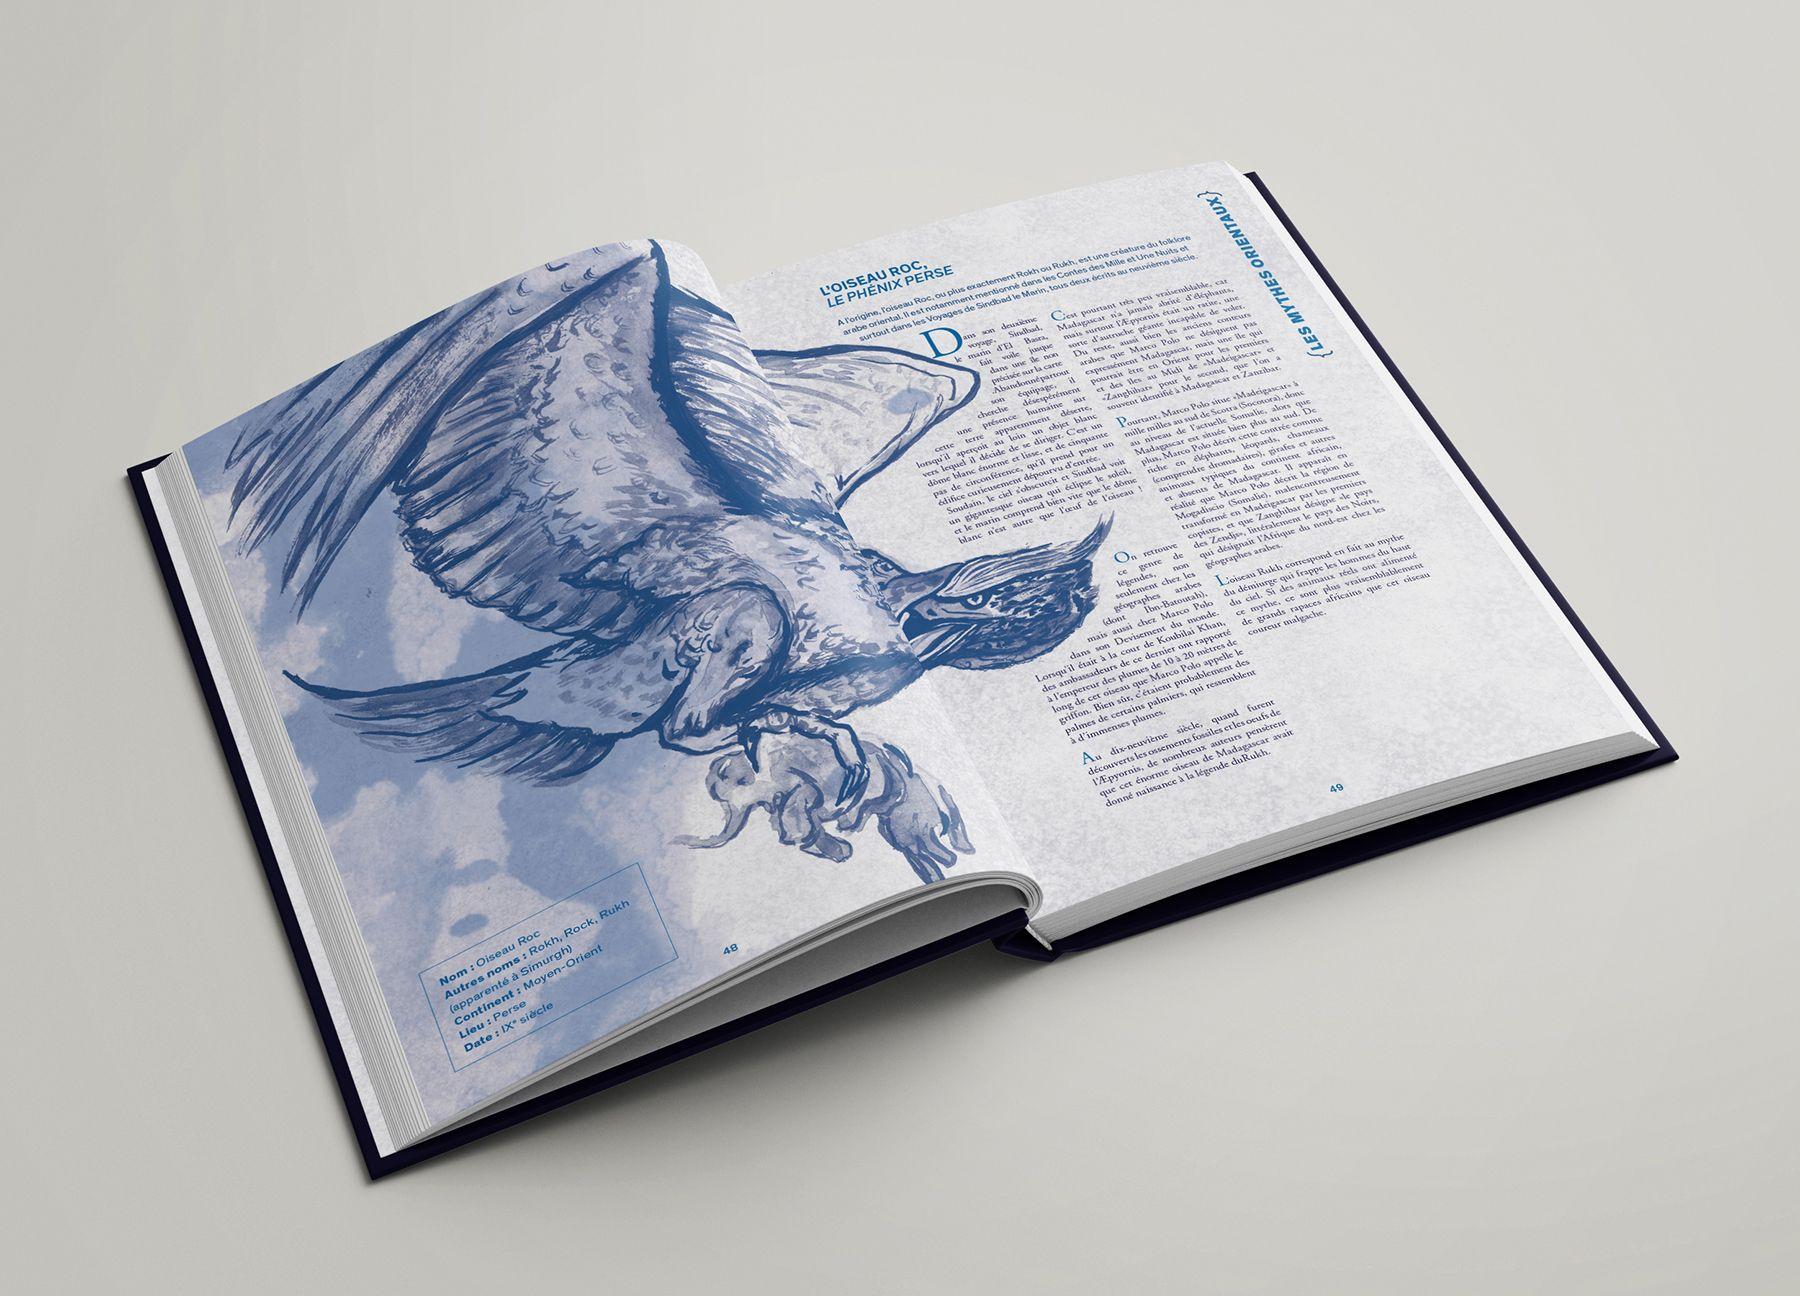 Oiseau Rock du recueil Mytho(zoo)logie